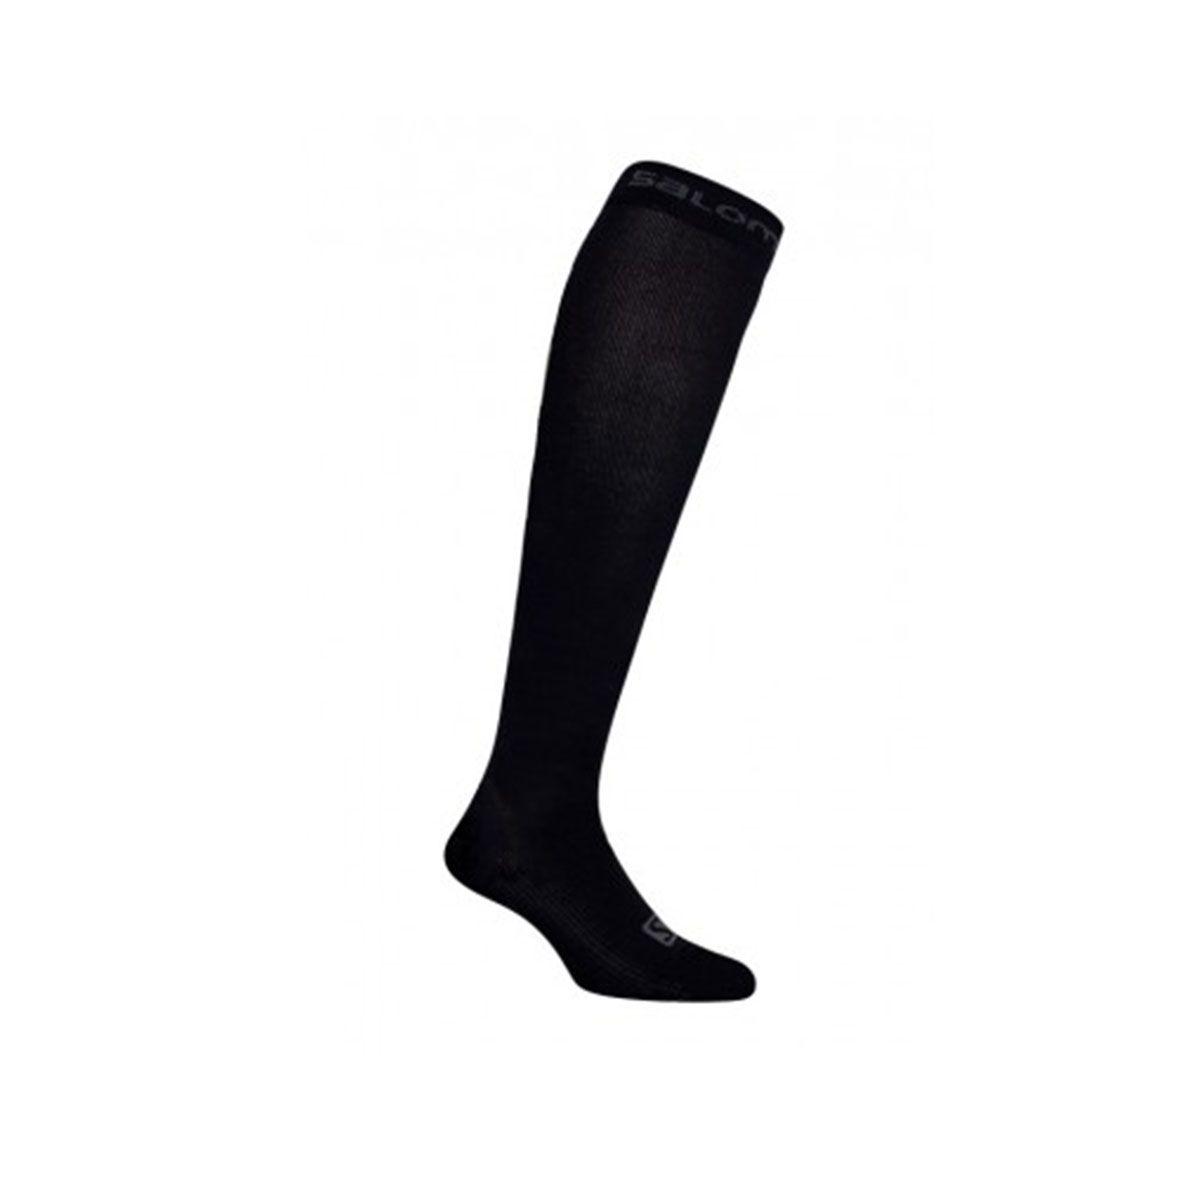 Meia Salomon Sock Compressão Preto